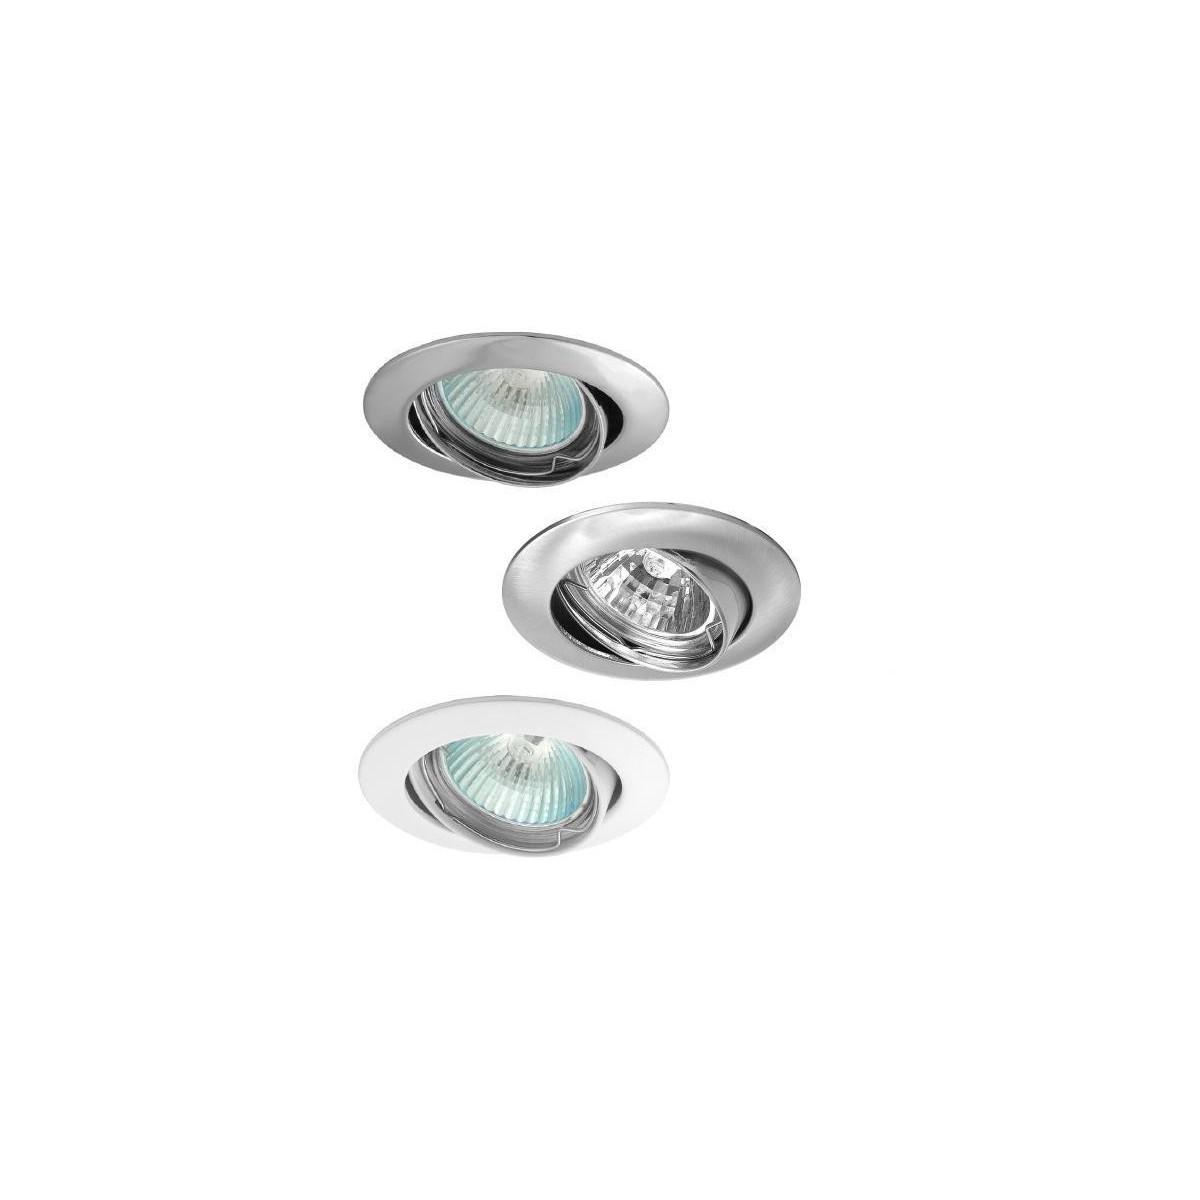 Bodovka - vestavné bodové svítidlo výklopné, GU10, chrom, Ø  82 mm